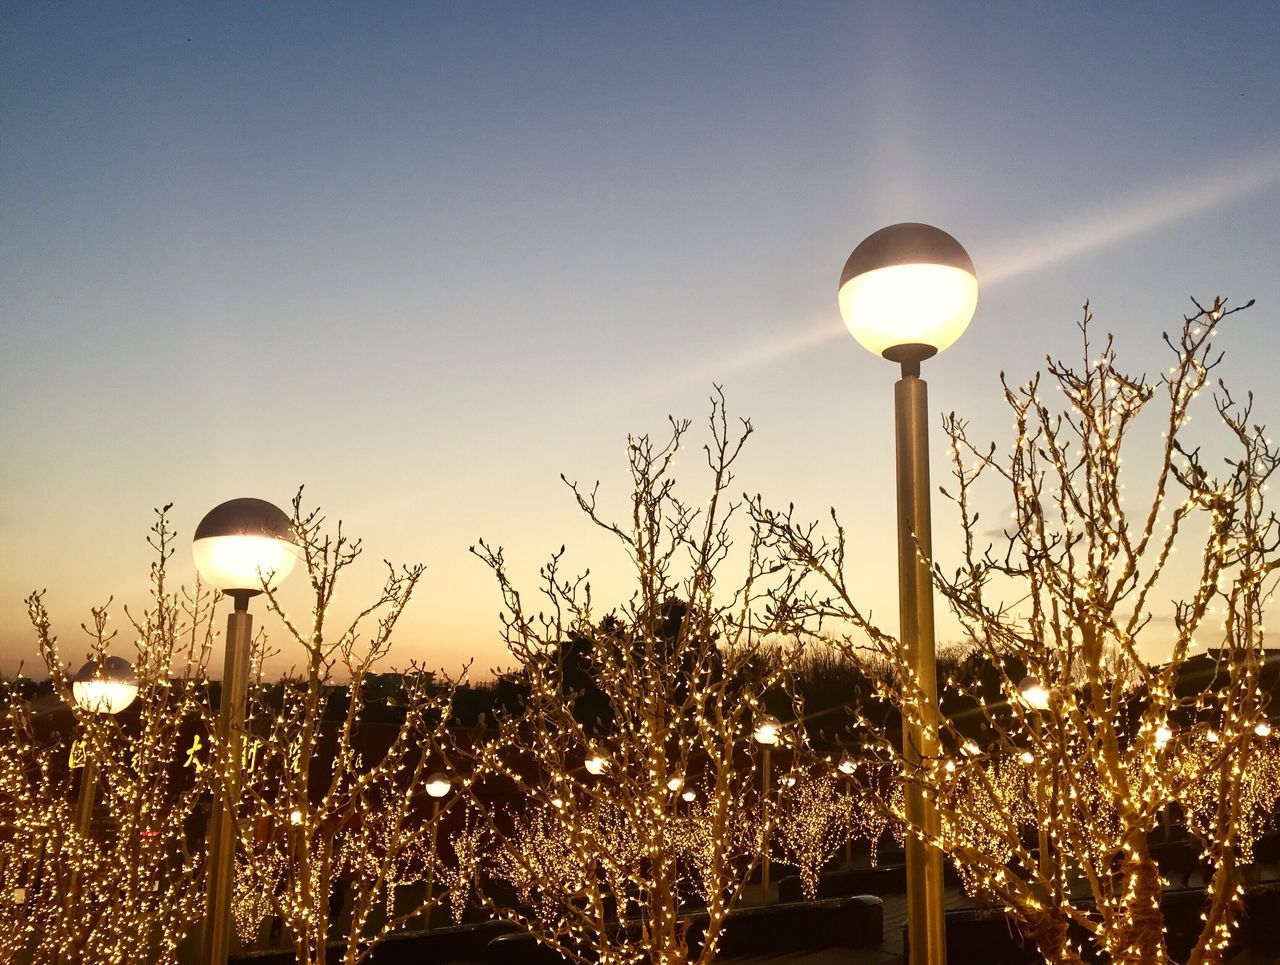 illuminated, lighting equipment, plant, sun, growth, no people, nature, street light, outdoors, sky, flower, beauty in nature, tree, moon, fragility